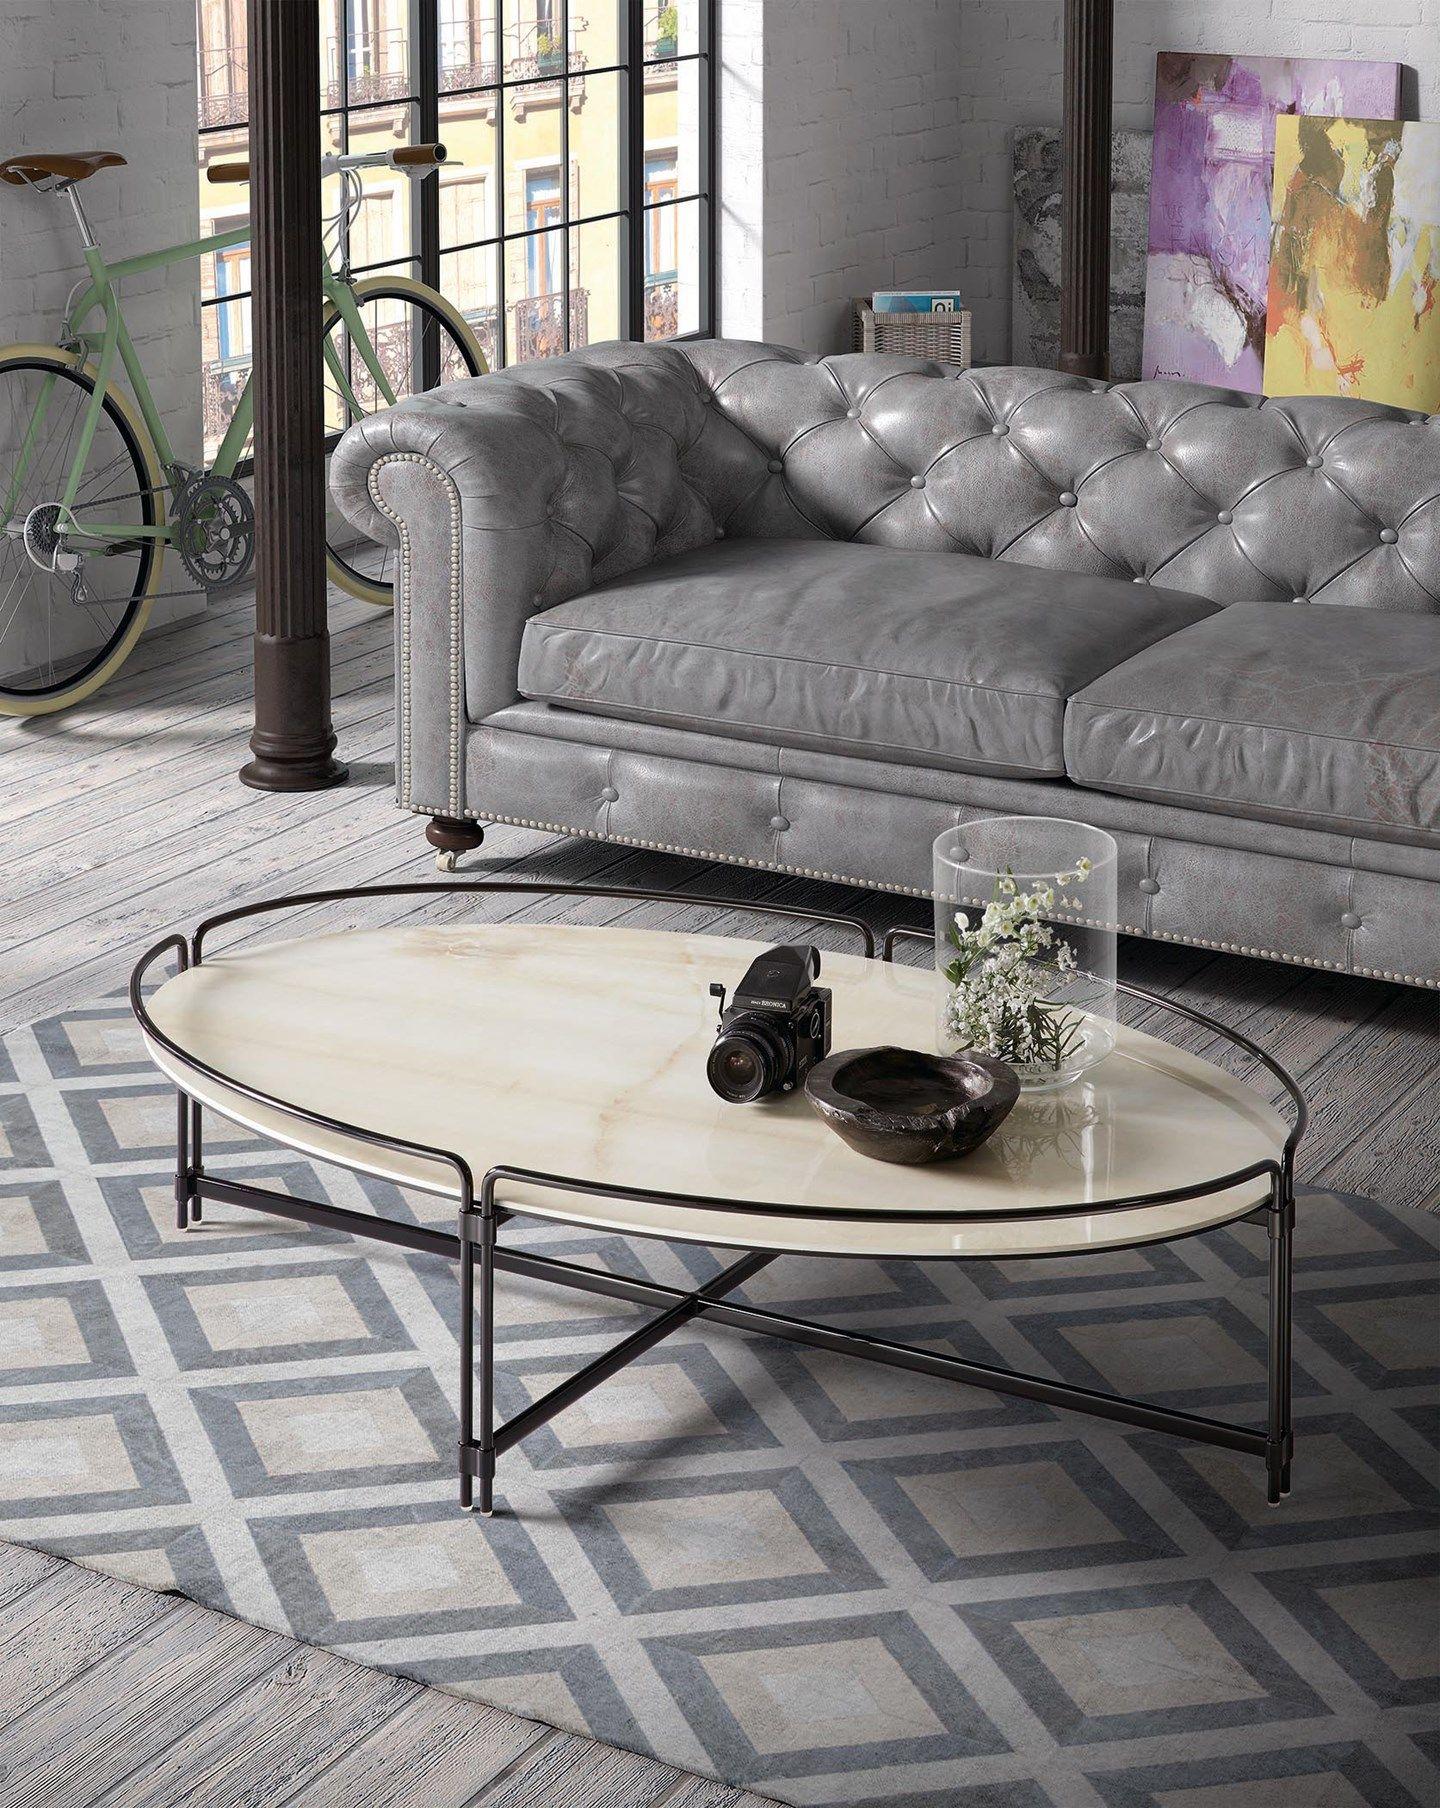 Join Coffee Table Dressy Www Dressy Design En Interiordesign Homedecor Interiors Interiorstyling Livingro Coffee Table Spanish Furniture Furniture Design